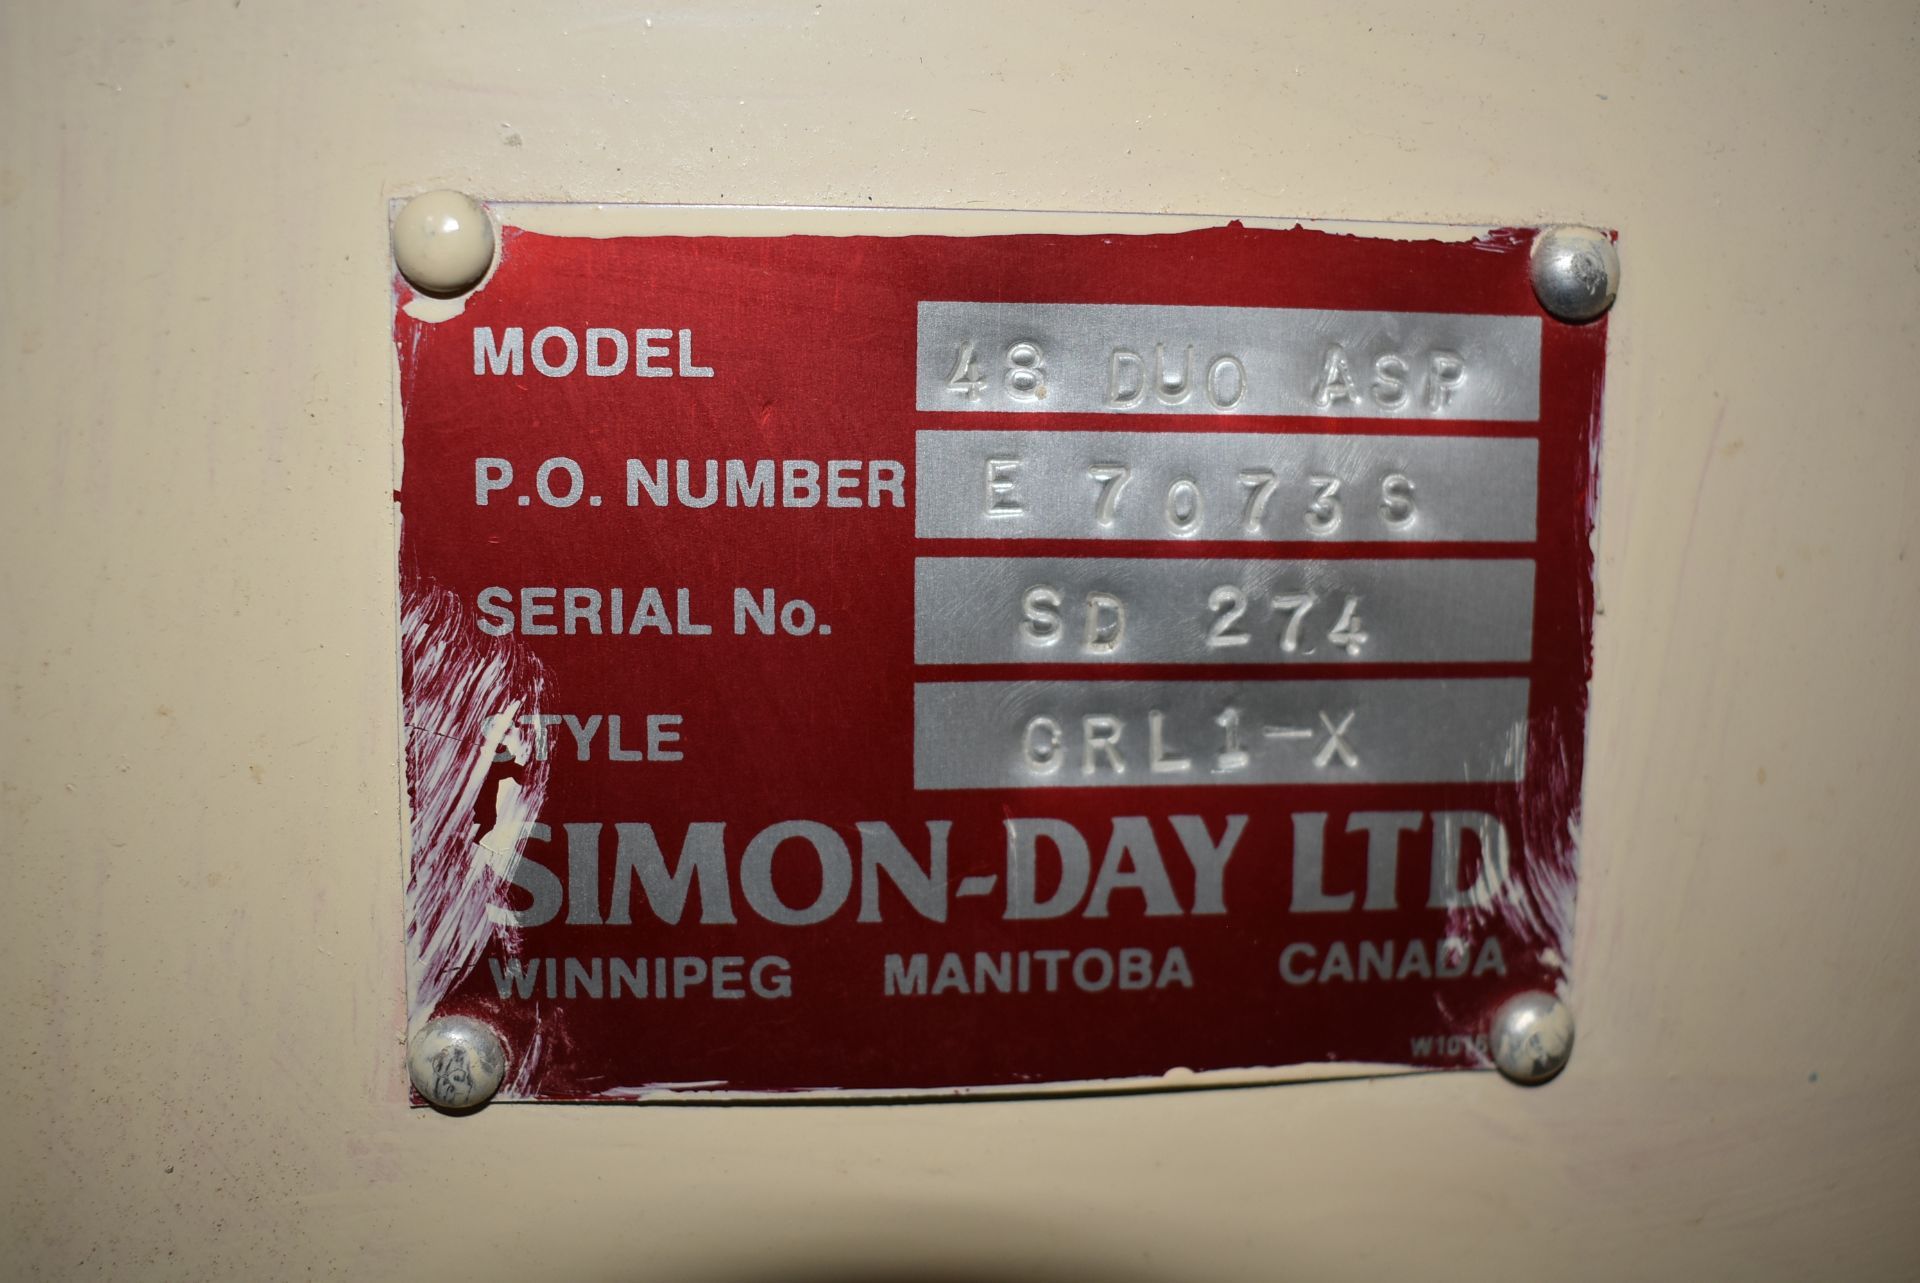 Simon Day Model #48 Duo Aspirator, SN SD 275, Style CRLI-X - Image 3 of 4